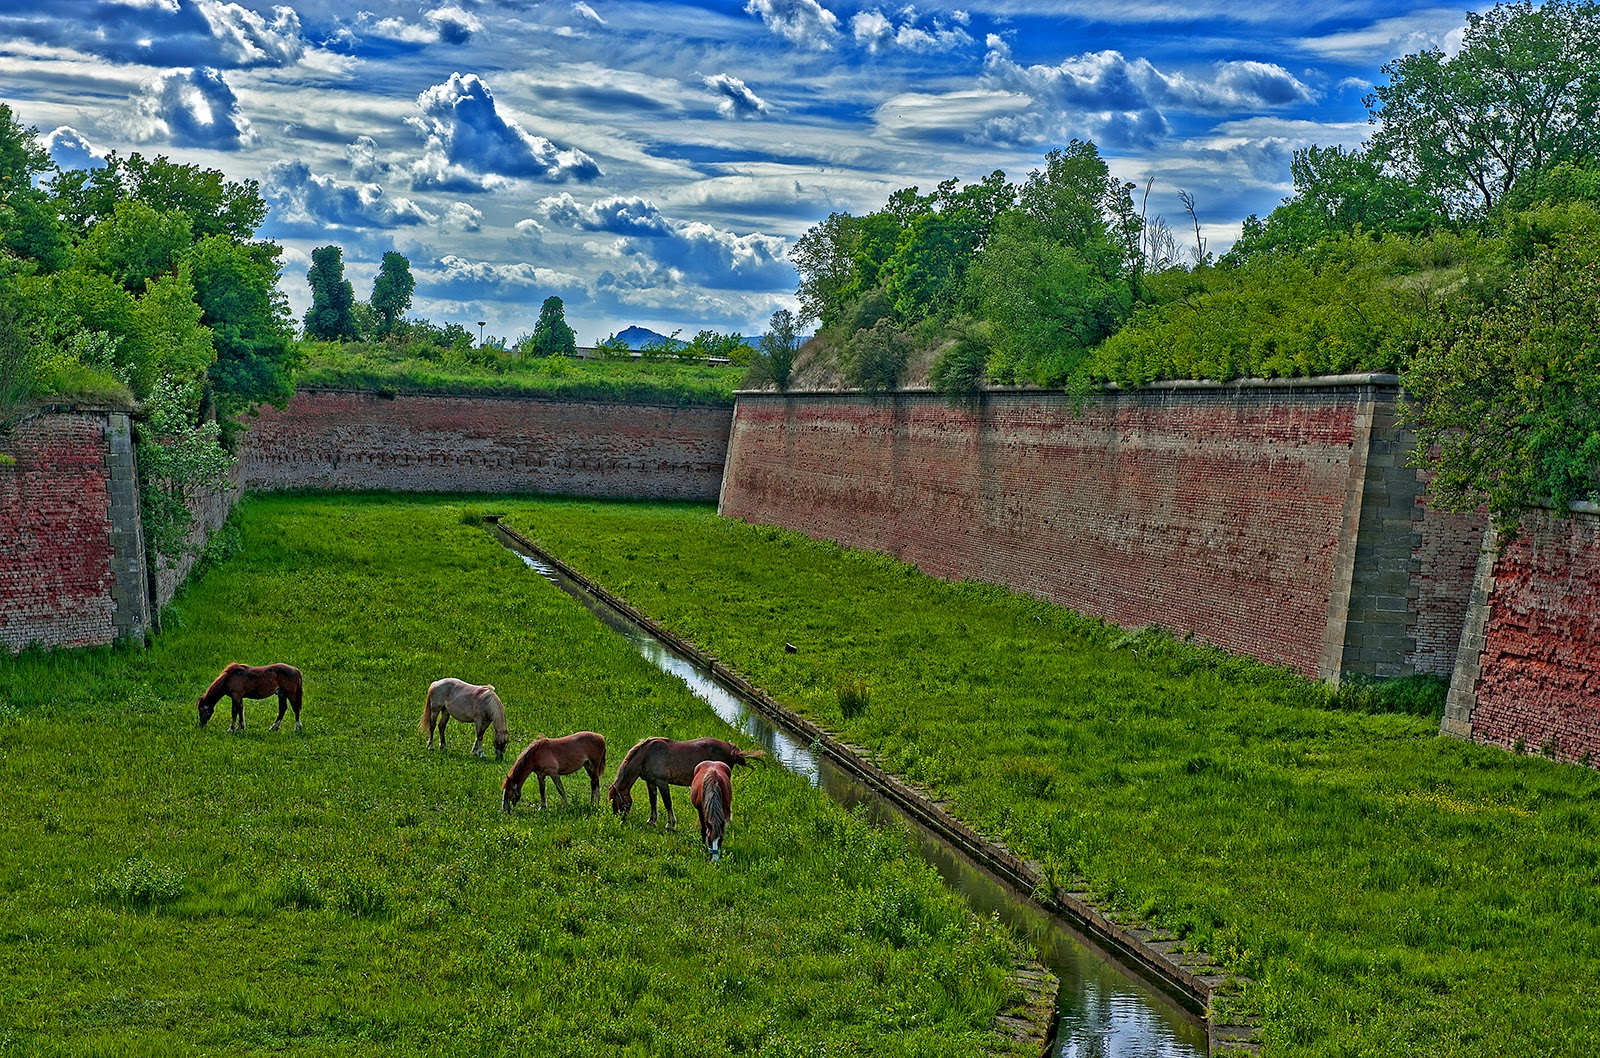 Terezin, Czech Republic, fortress, fortress moat, fortress walls